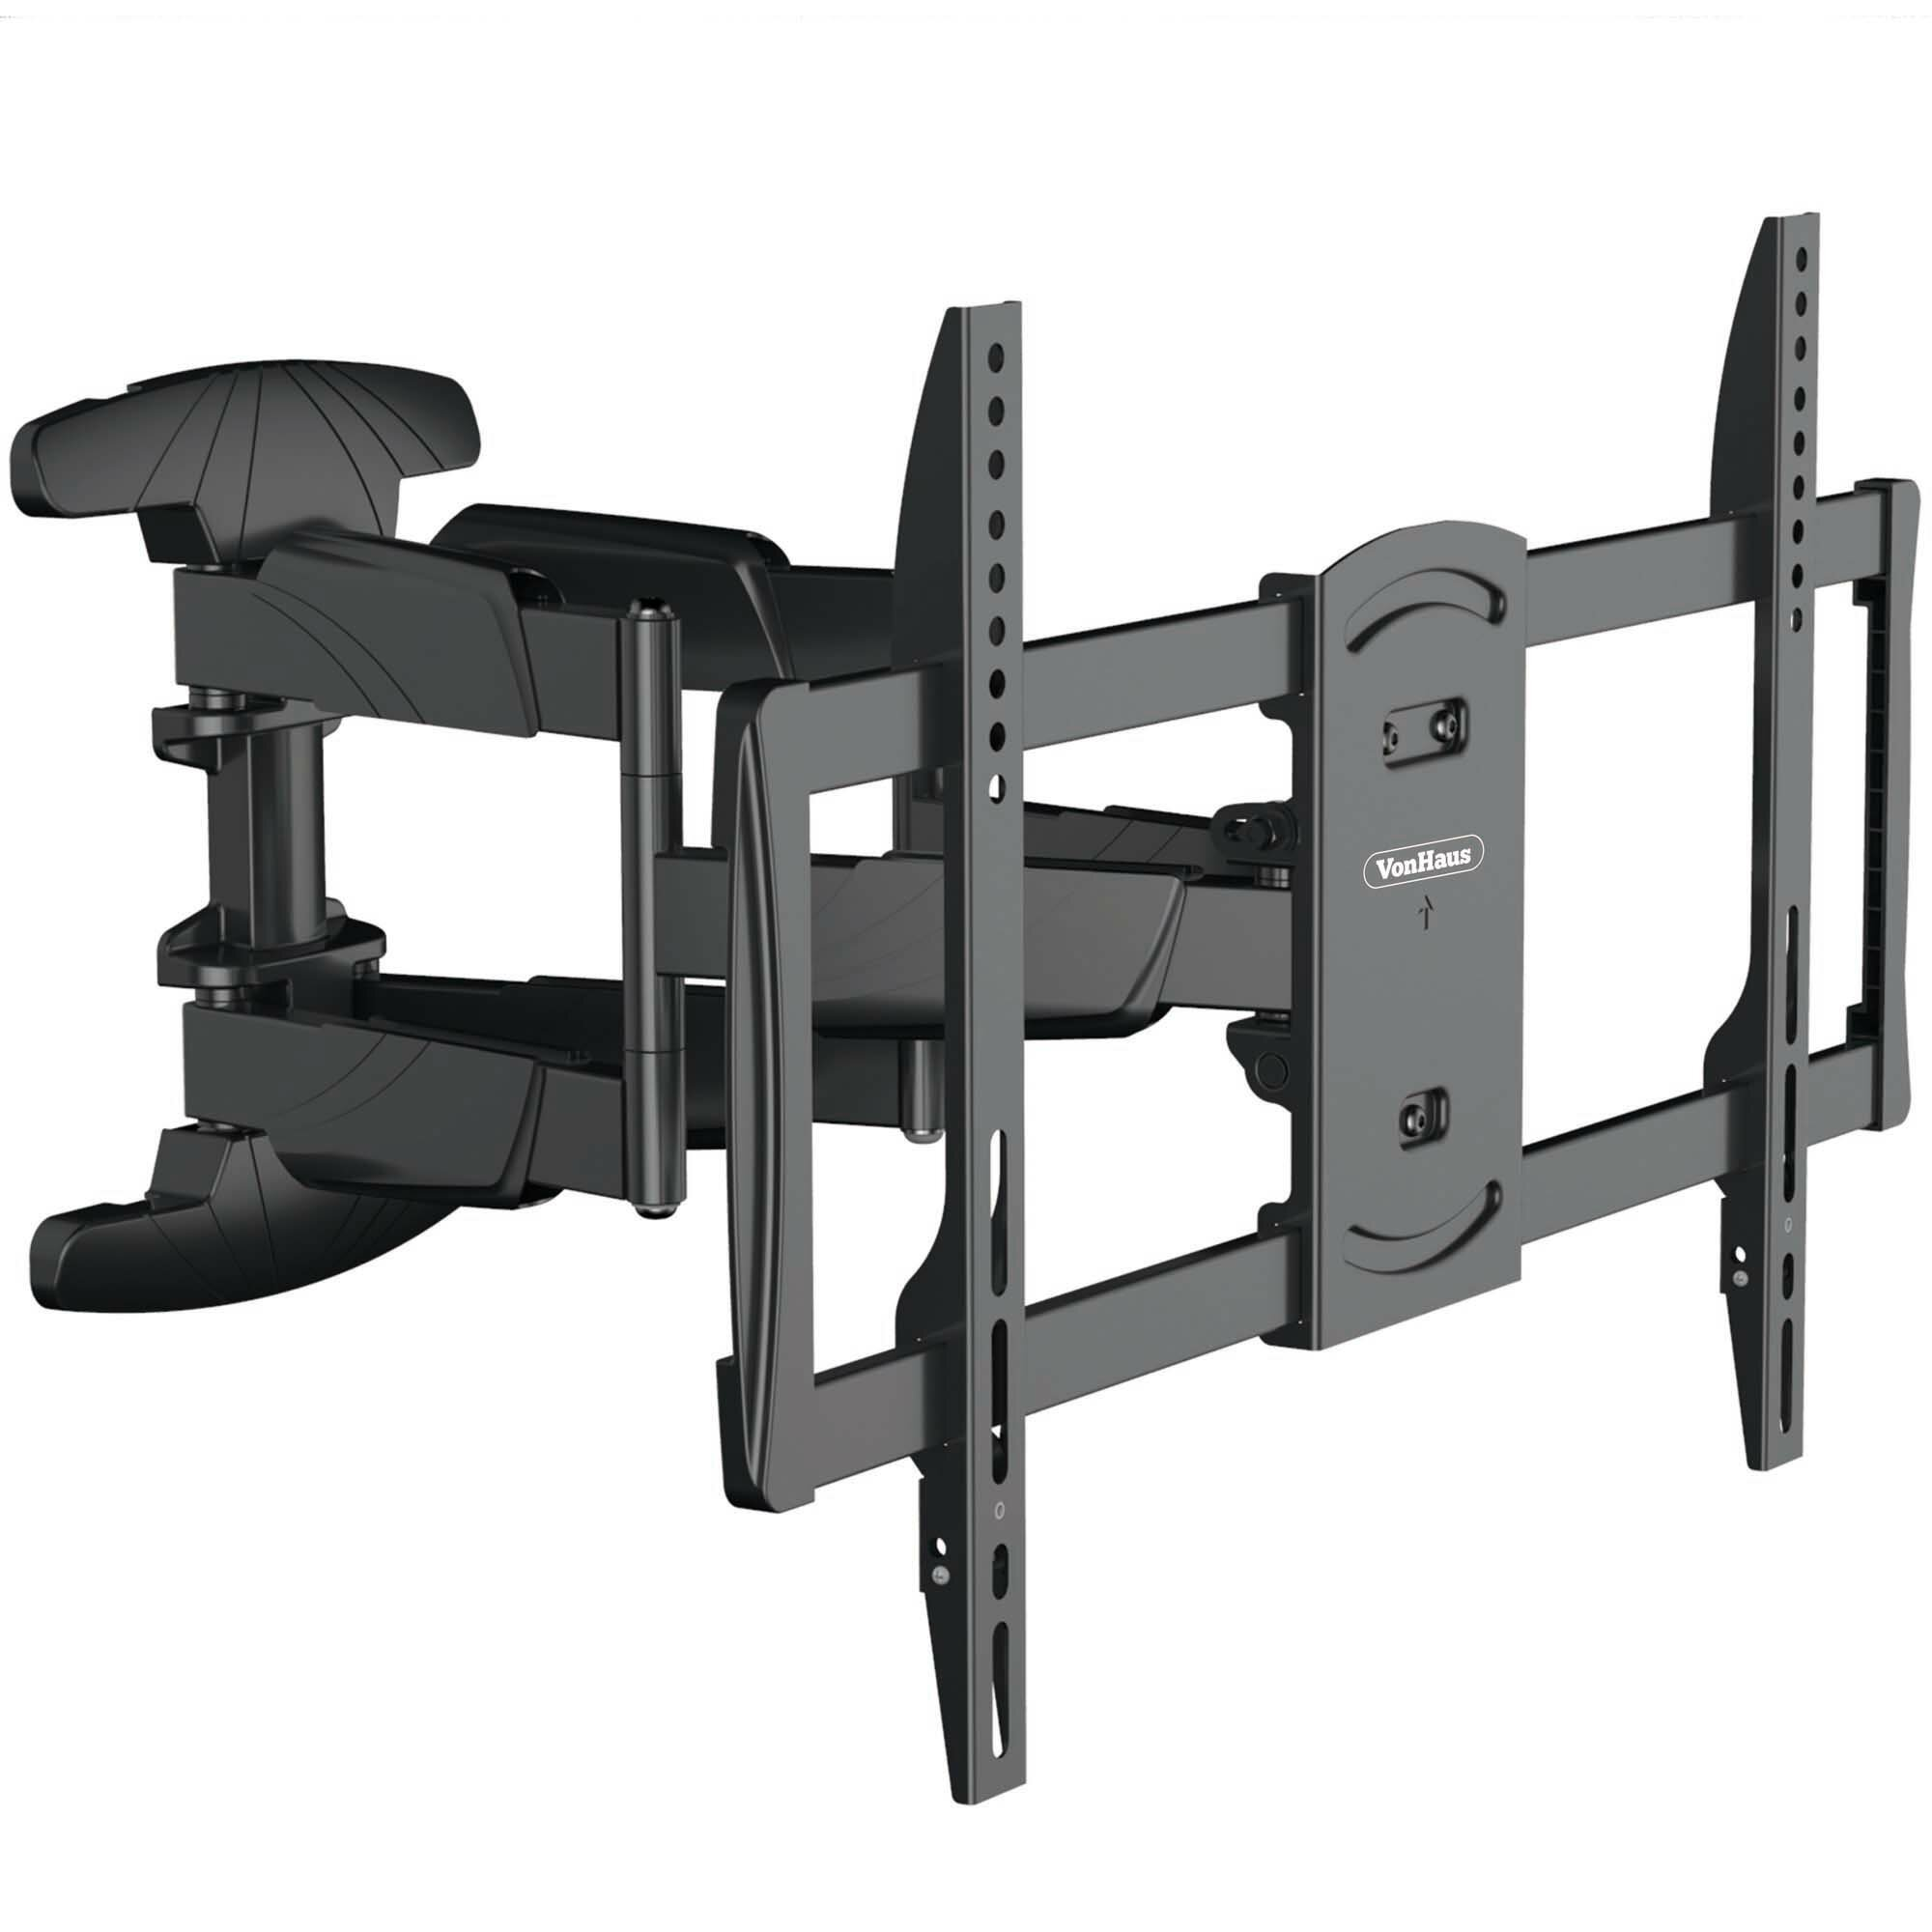 VonHaus Premium Double Arm Articulating TV Wall Mount 37